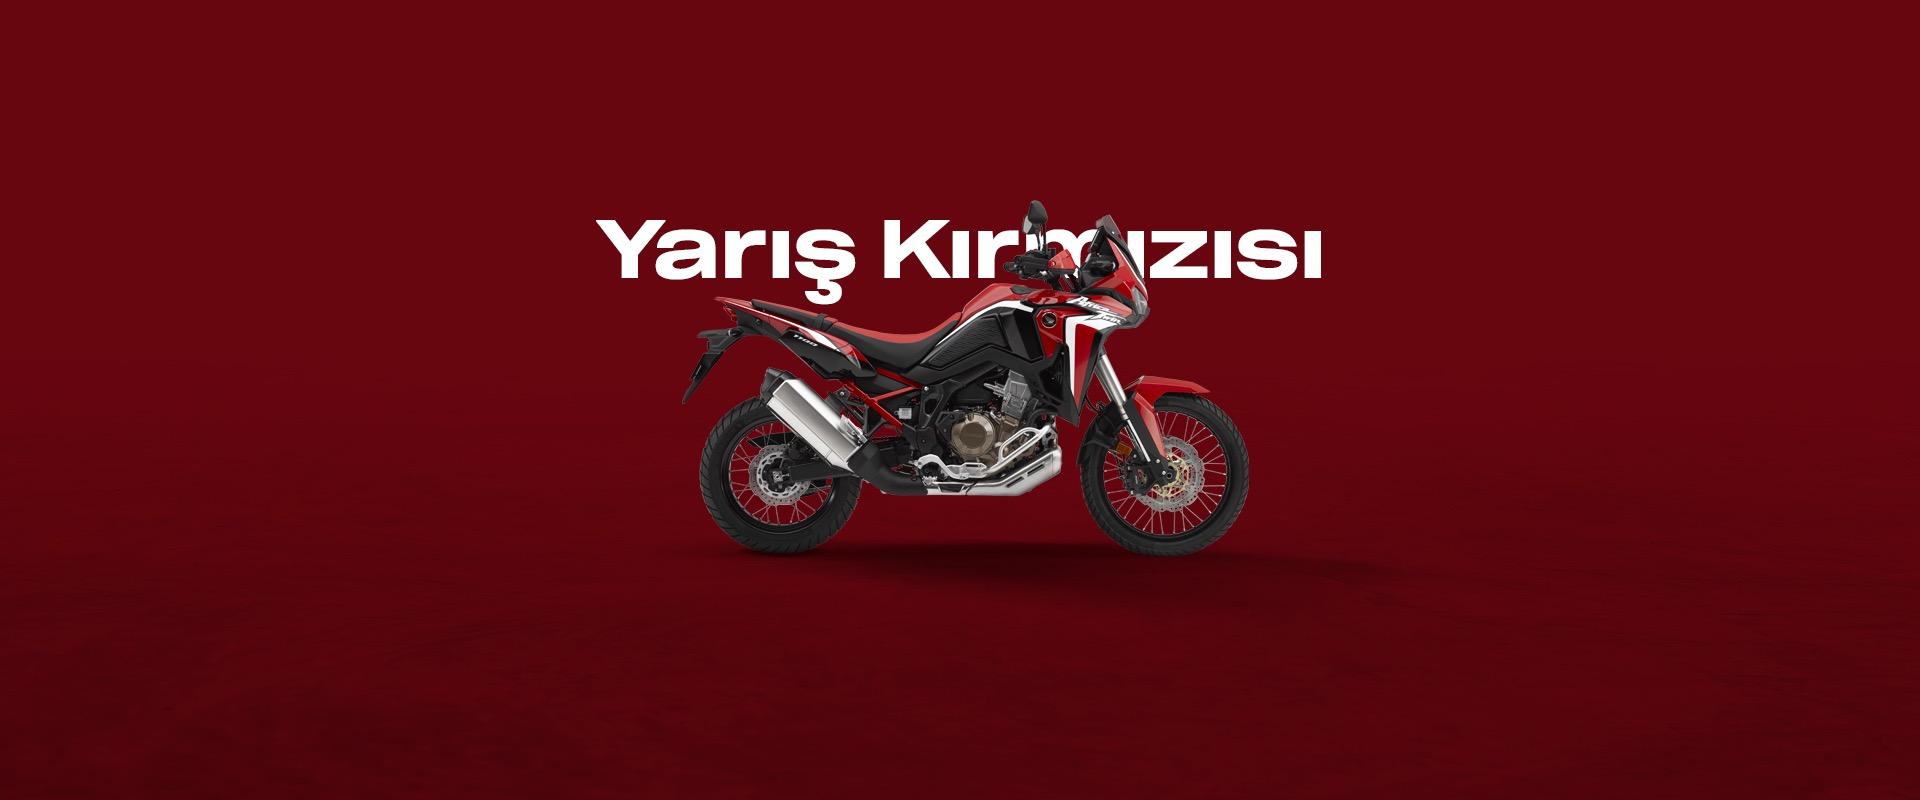 GÜNGÖR MOTOR Yarış Kırmızısı